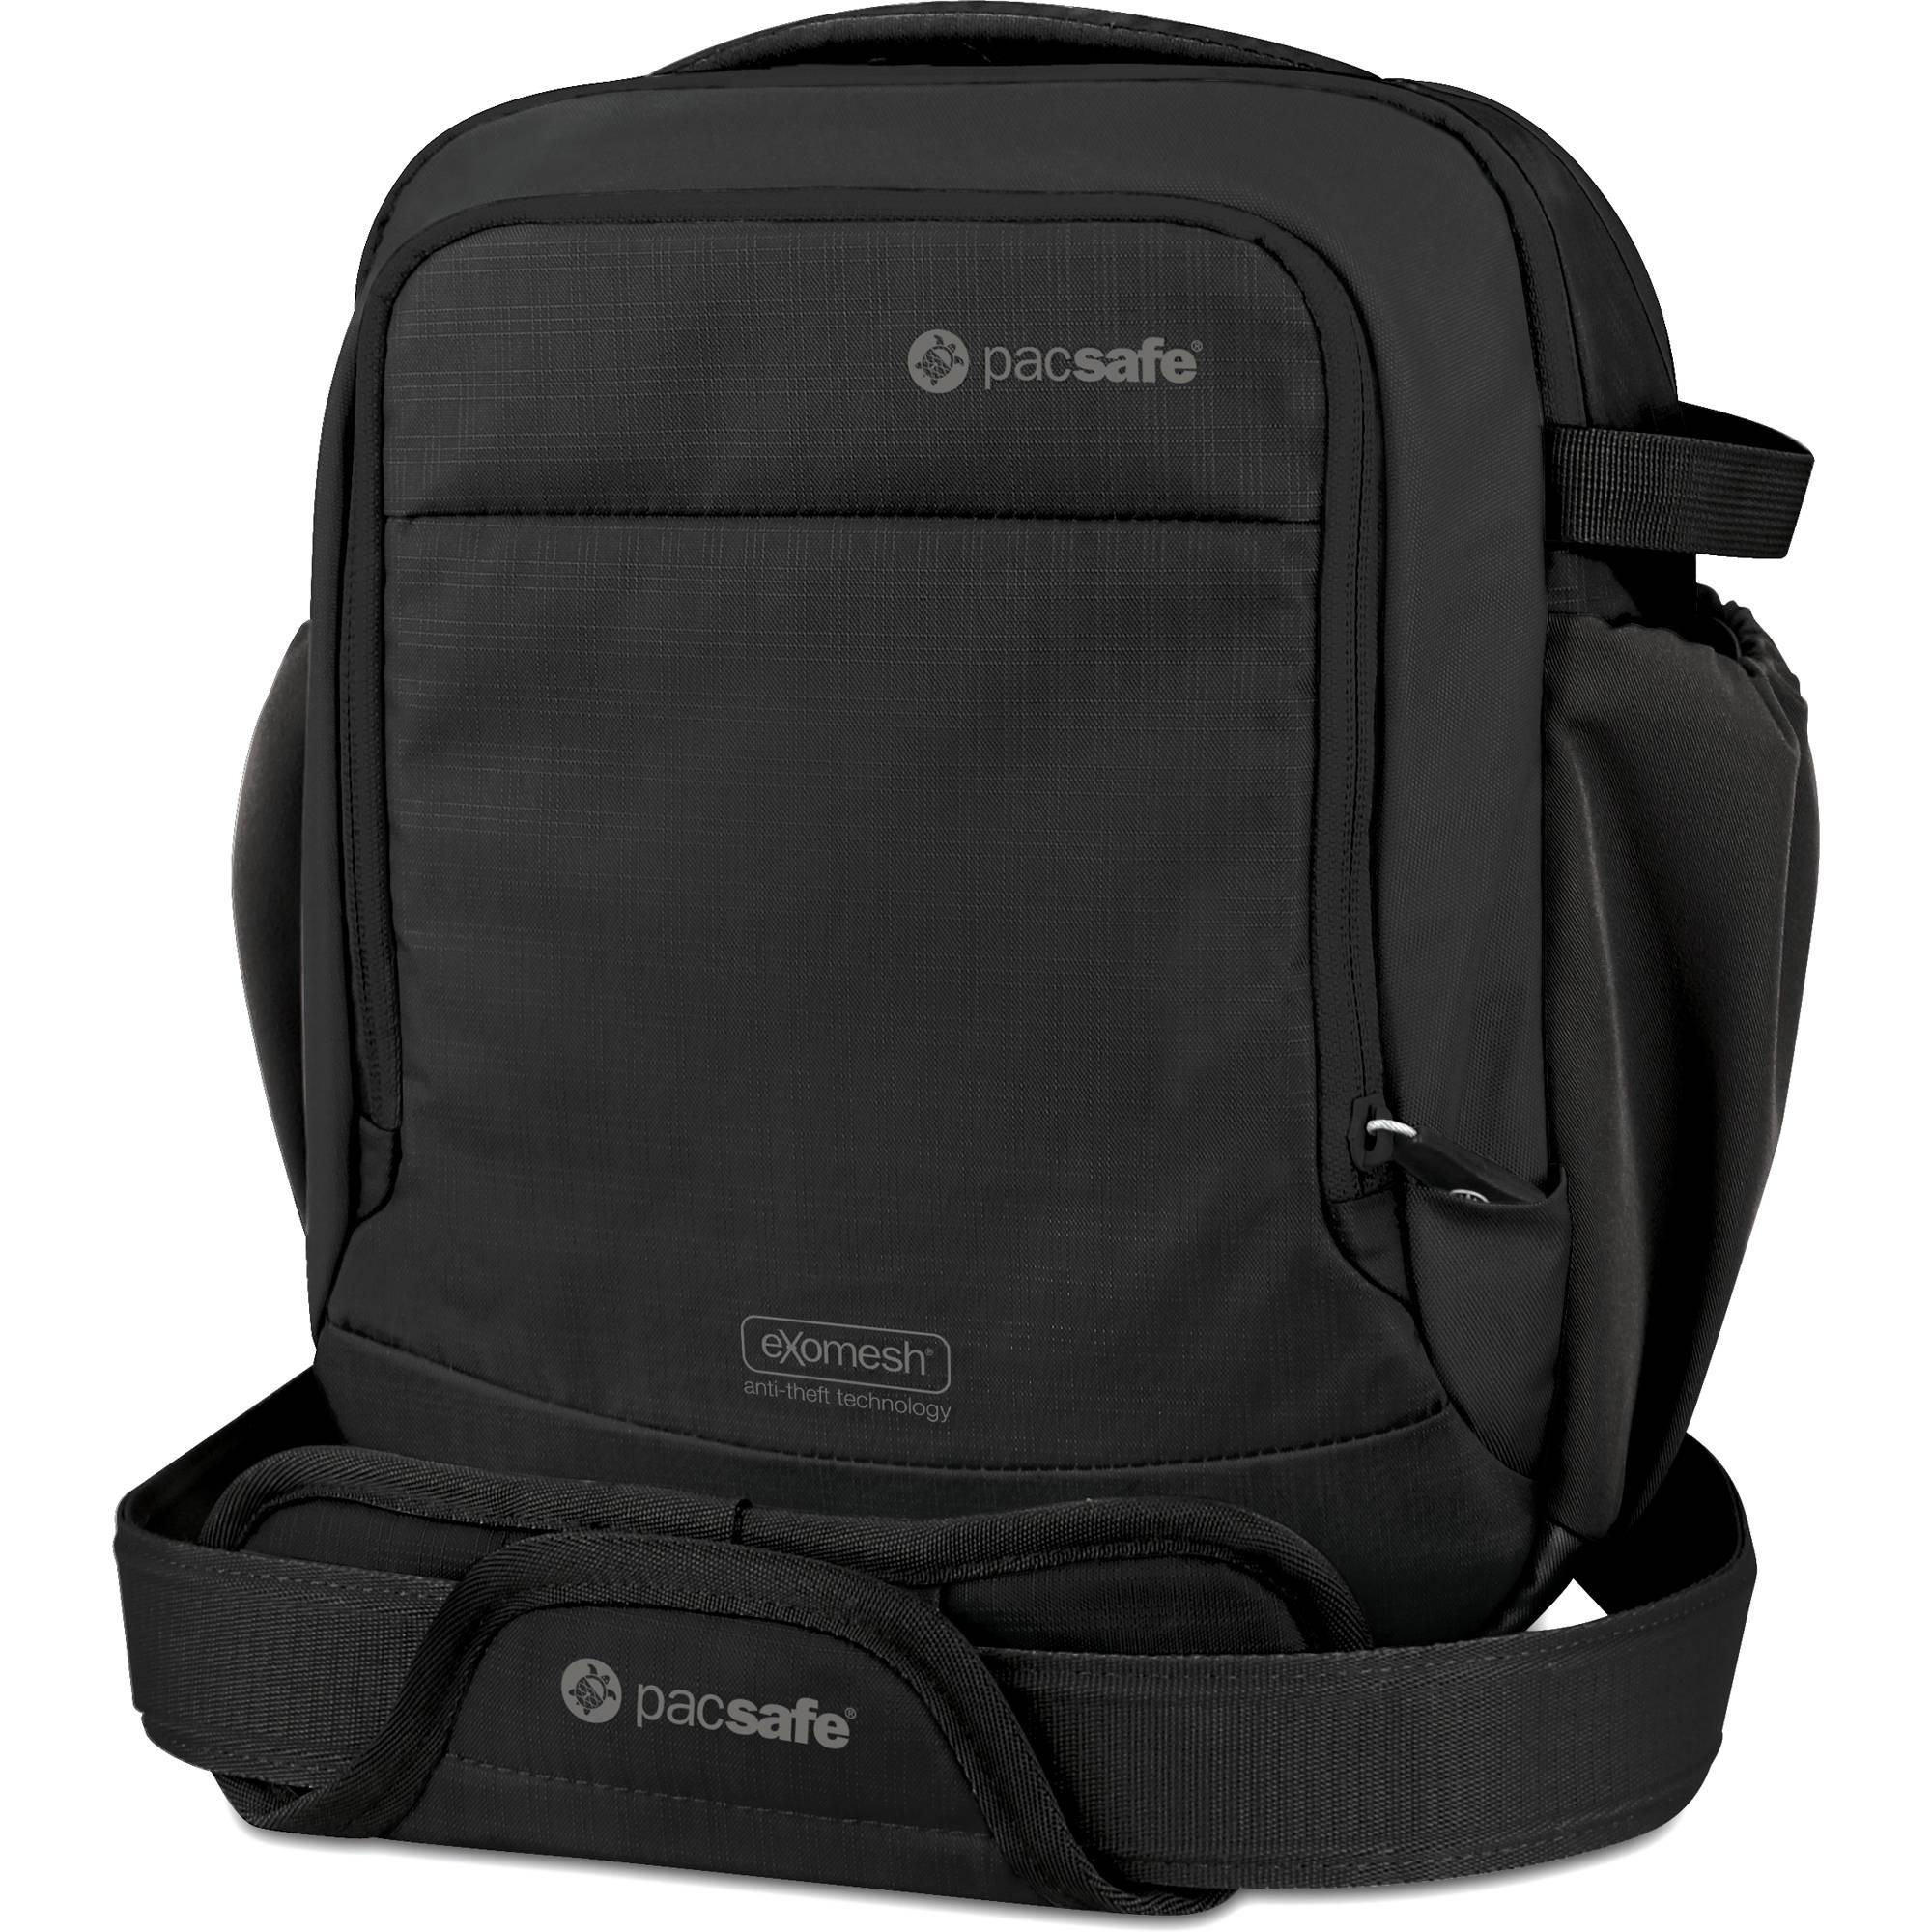 Pacsafe Camsafe V8 Anti Theft Camera Shoulder Bag Black